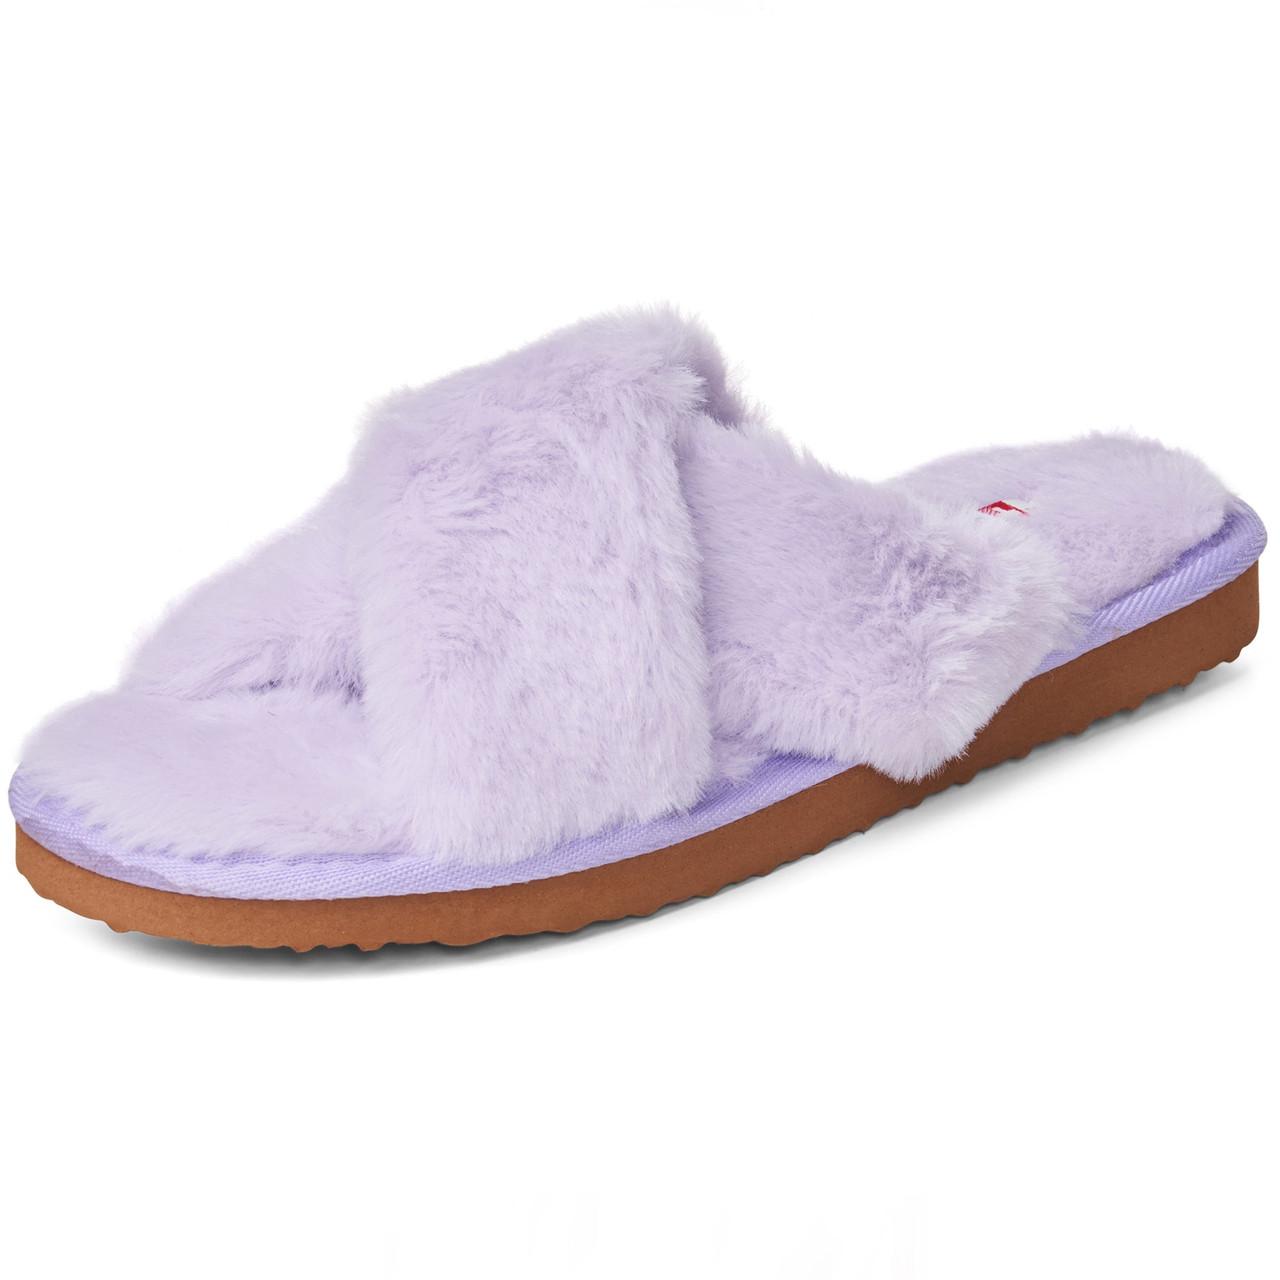 Women/'s Faux Fur Knit Memory Foam Slippers Comfort Indoor House Shoes